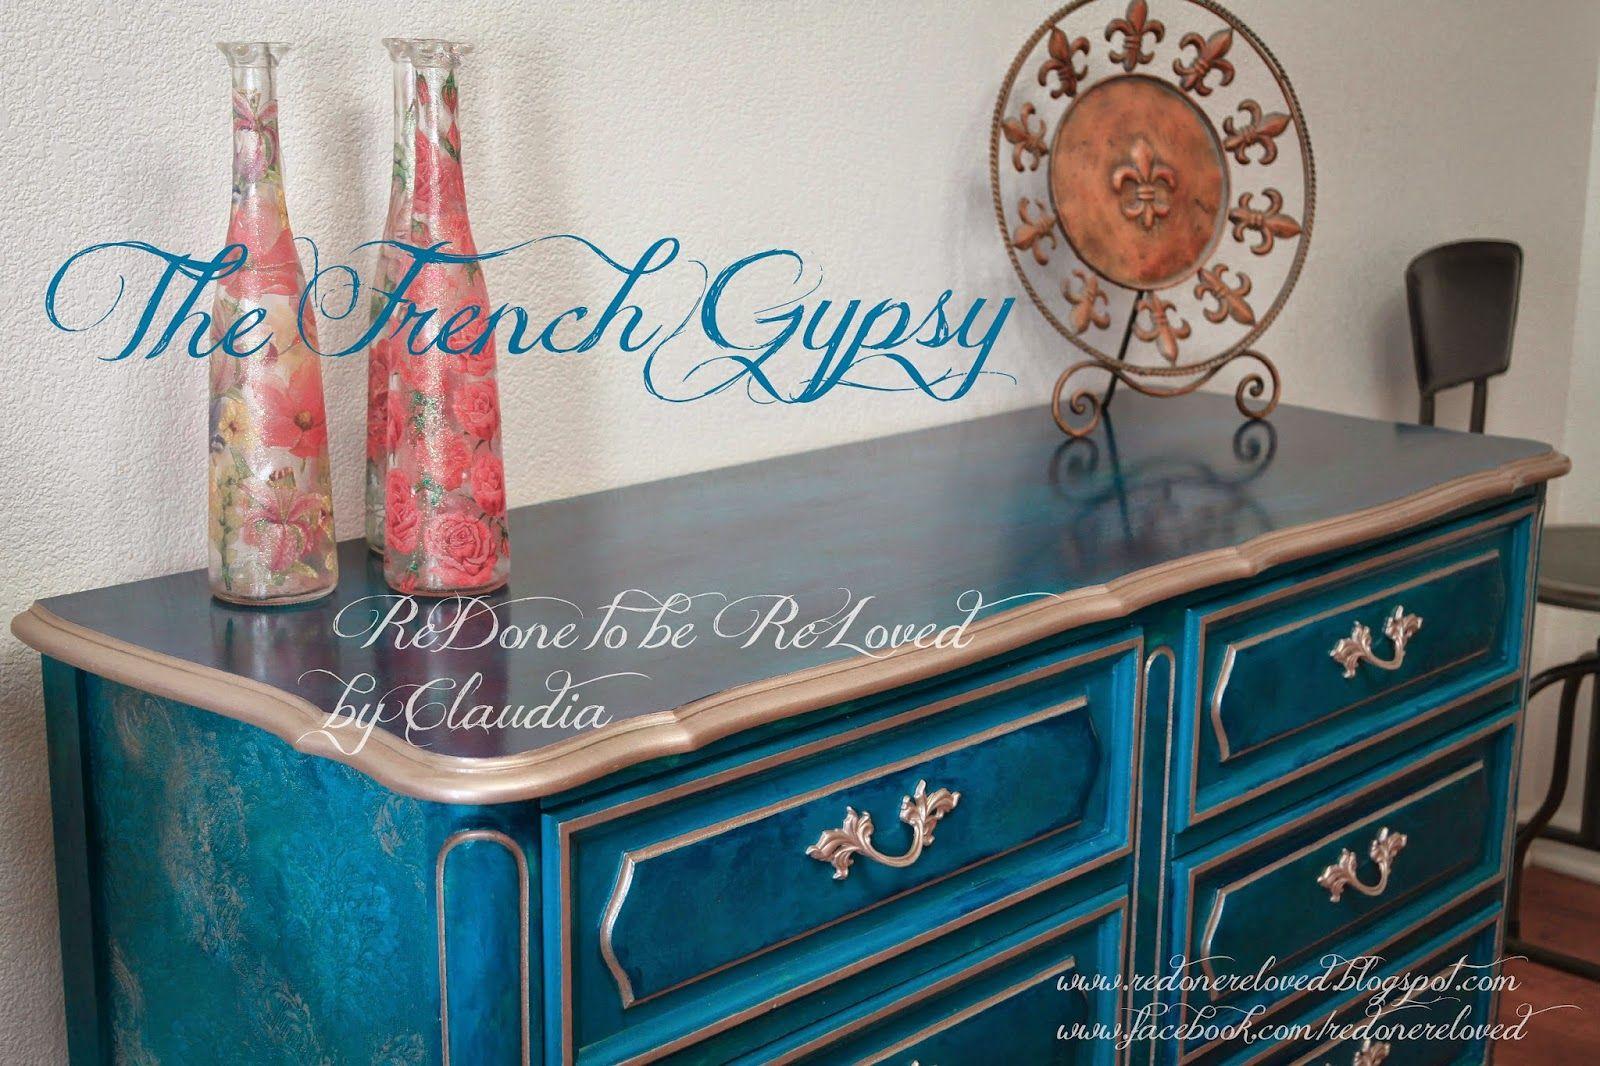 The French Gypsy Dresser